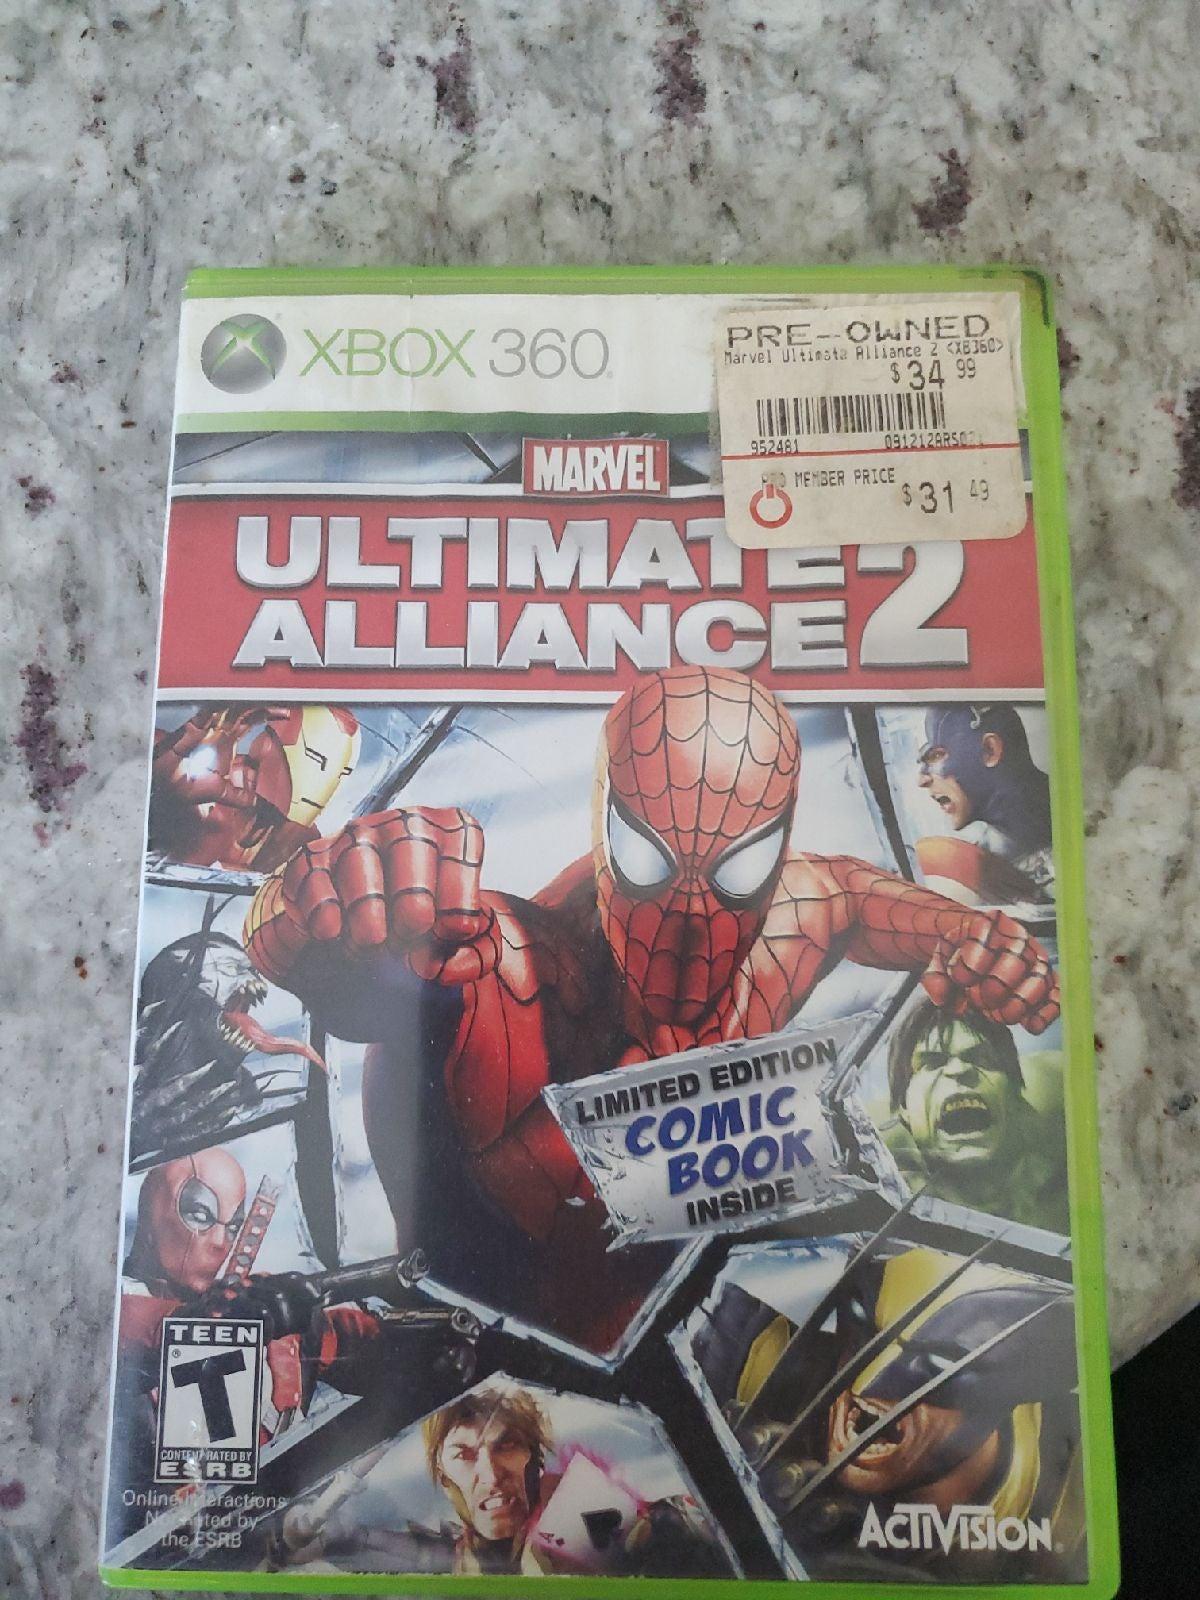 Ultimate Alliance 2 XBox 360